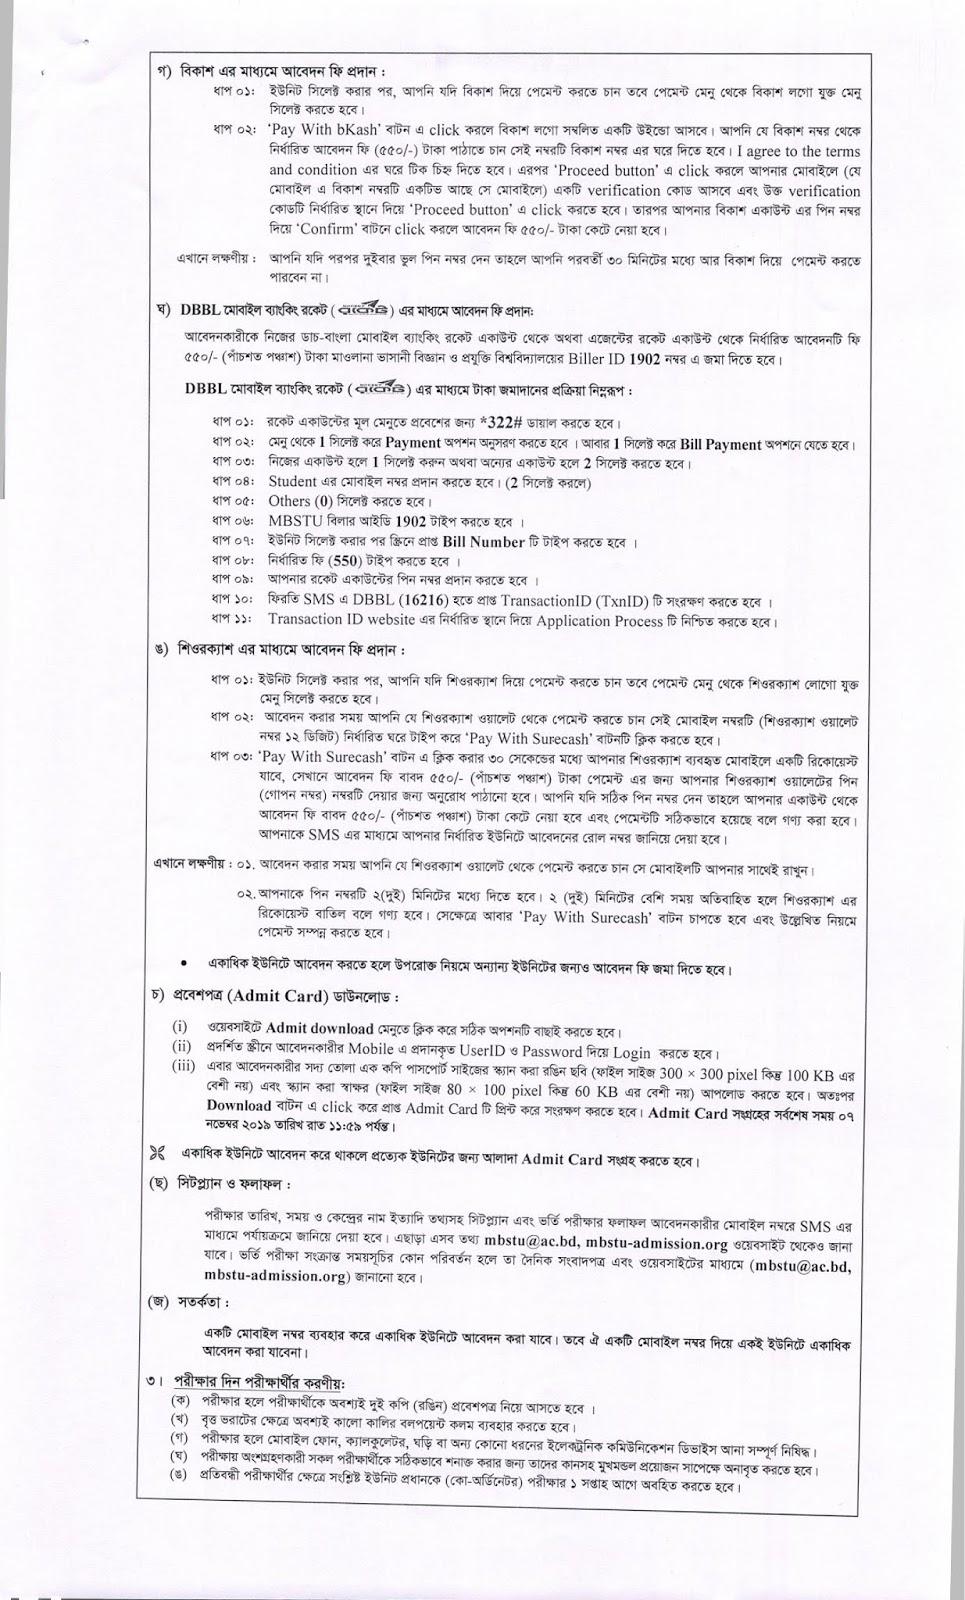 MBSTU Admission Circular 2019-2020 Download Notice